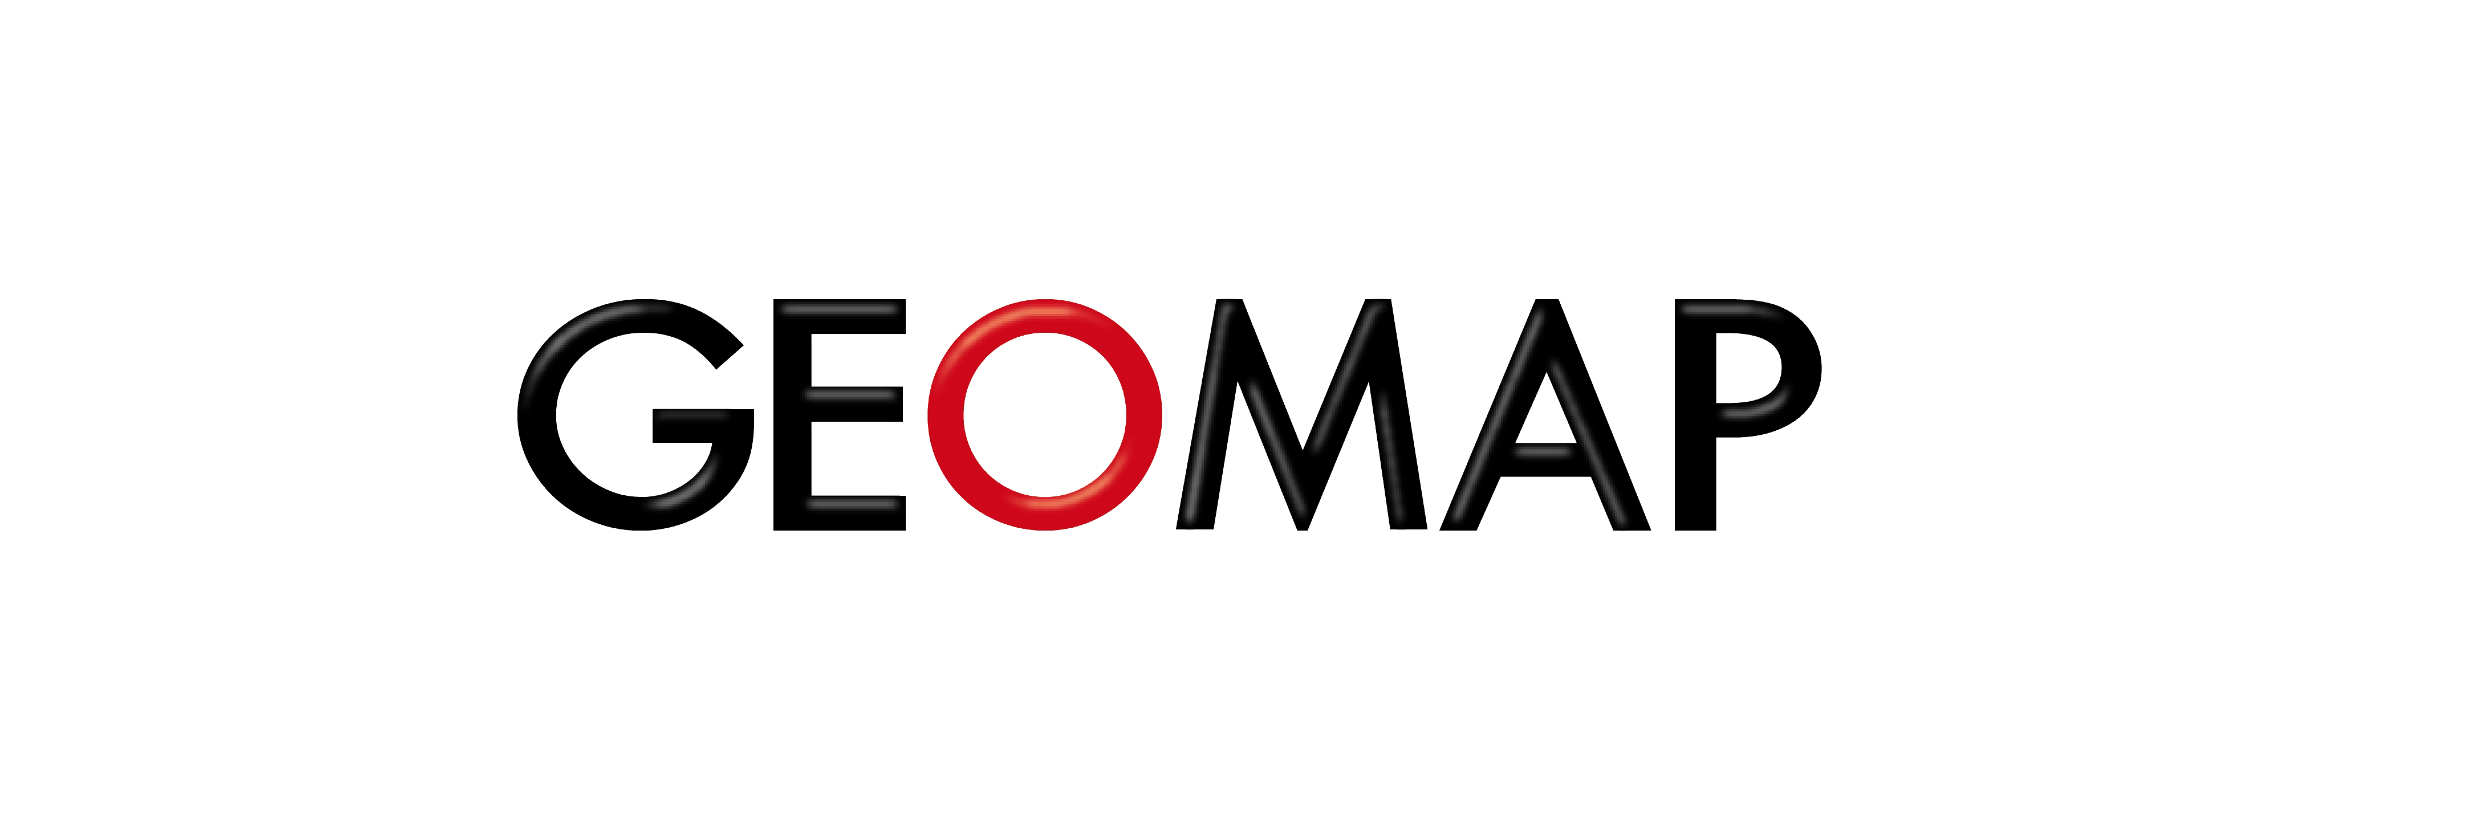 Geomap logo